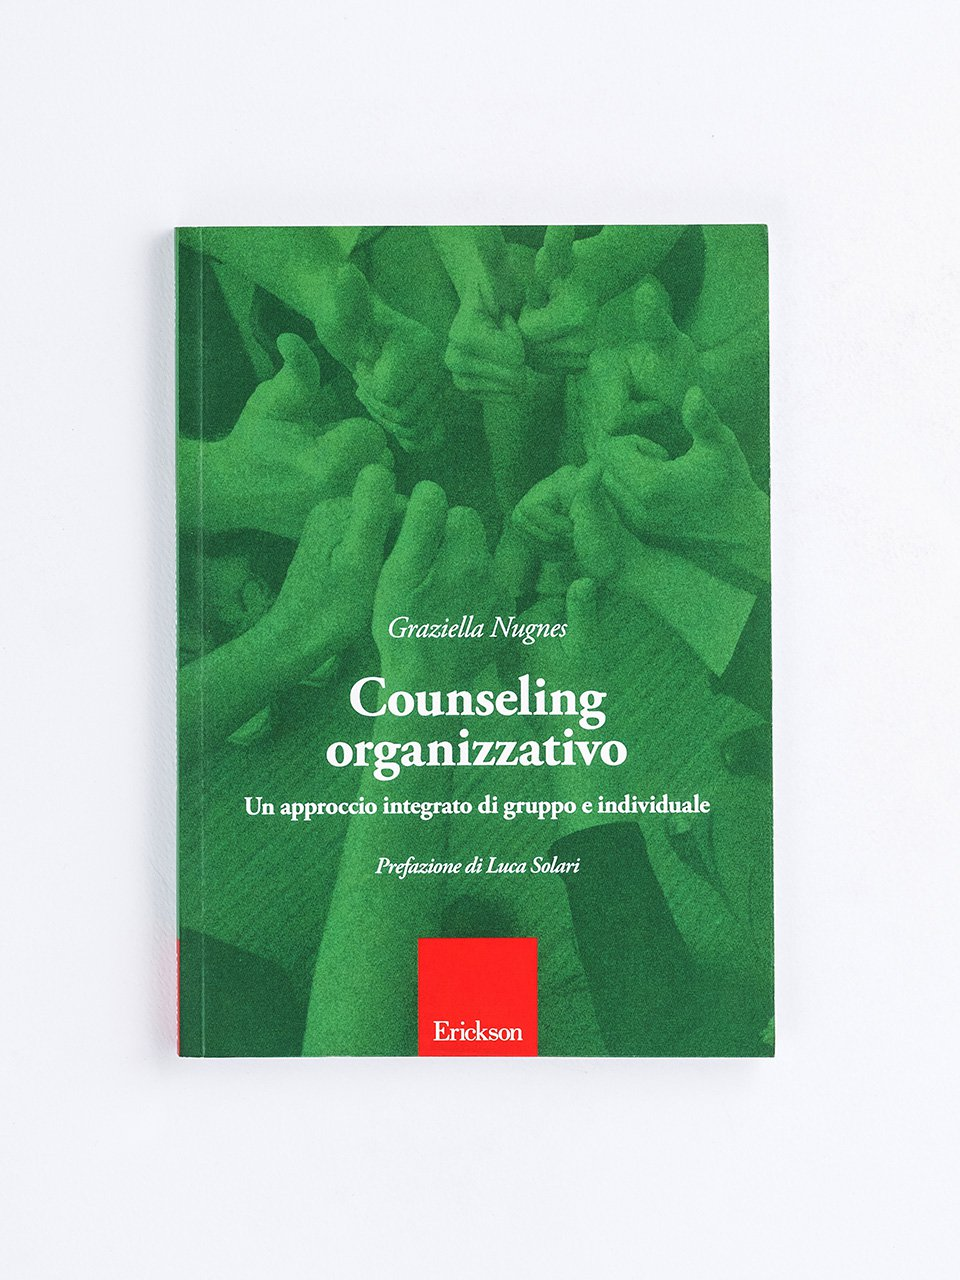 Counseling organizzativo - Counseling - Riviste - Erickson